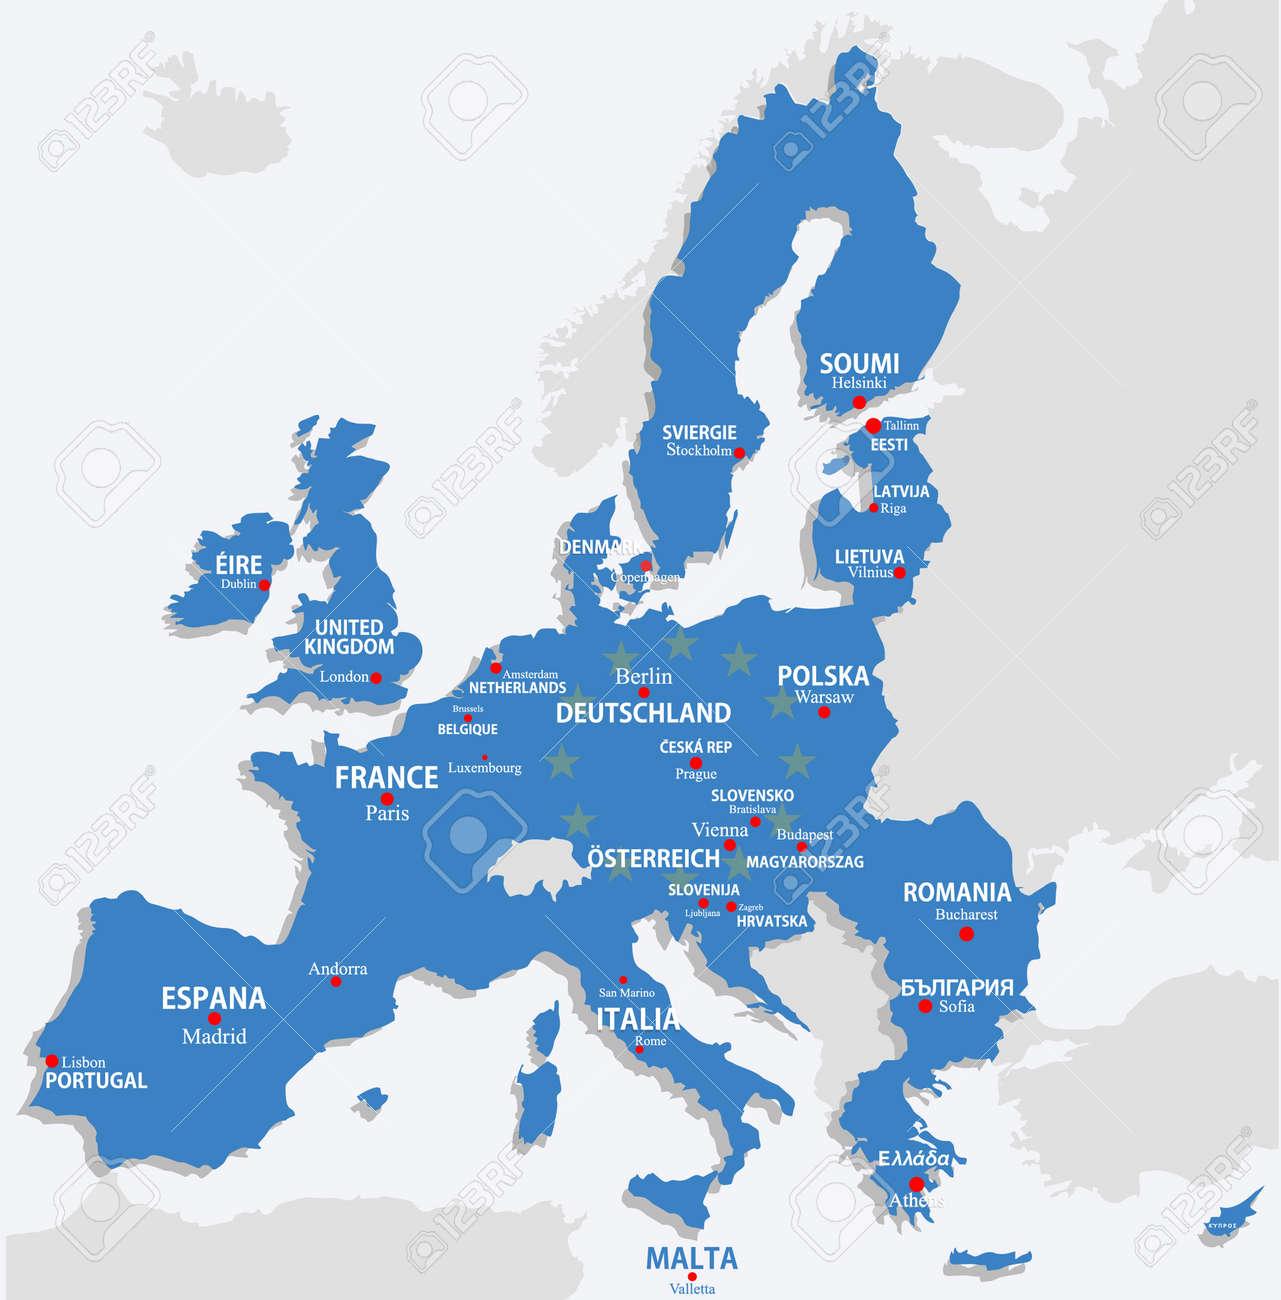 Länder Europas Karte.Stock Photo